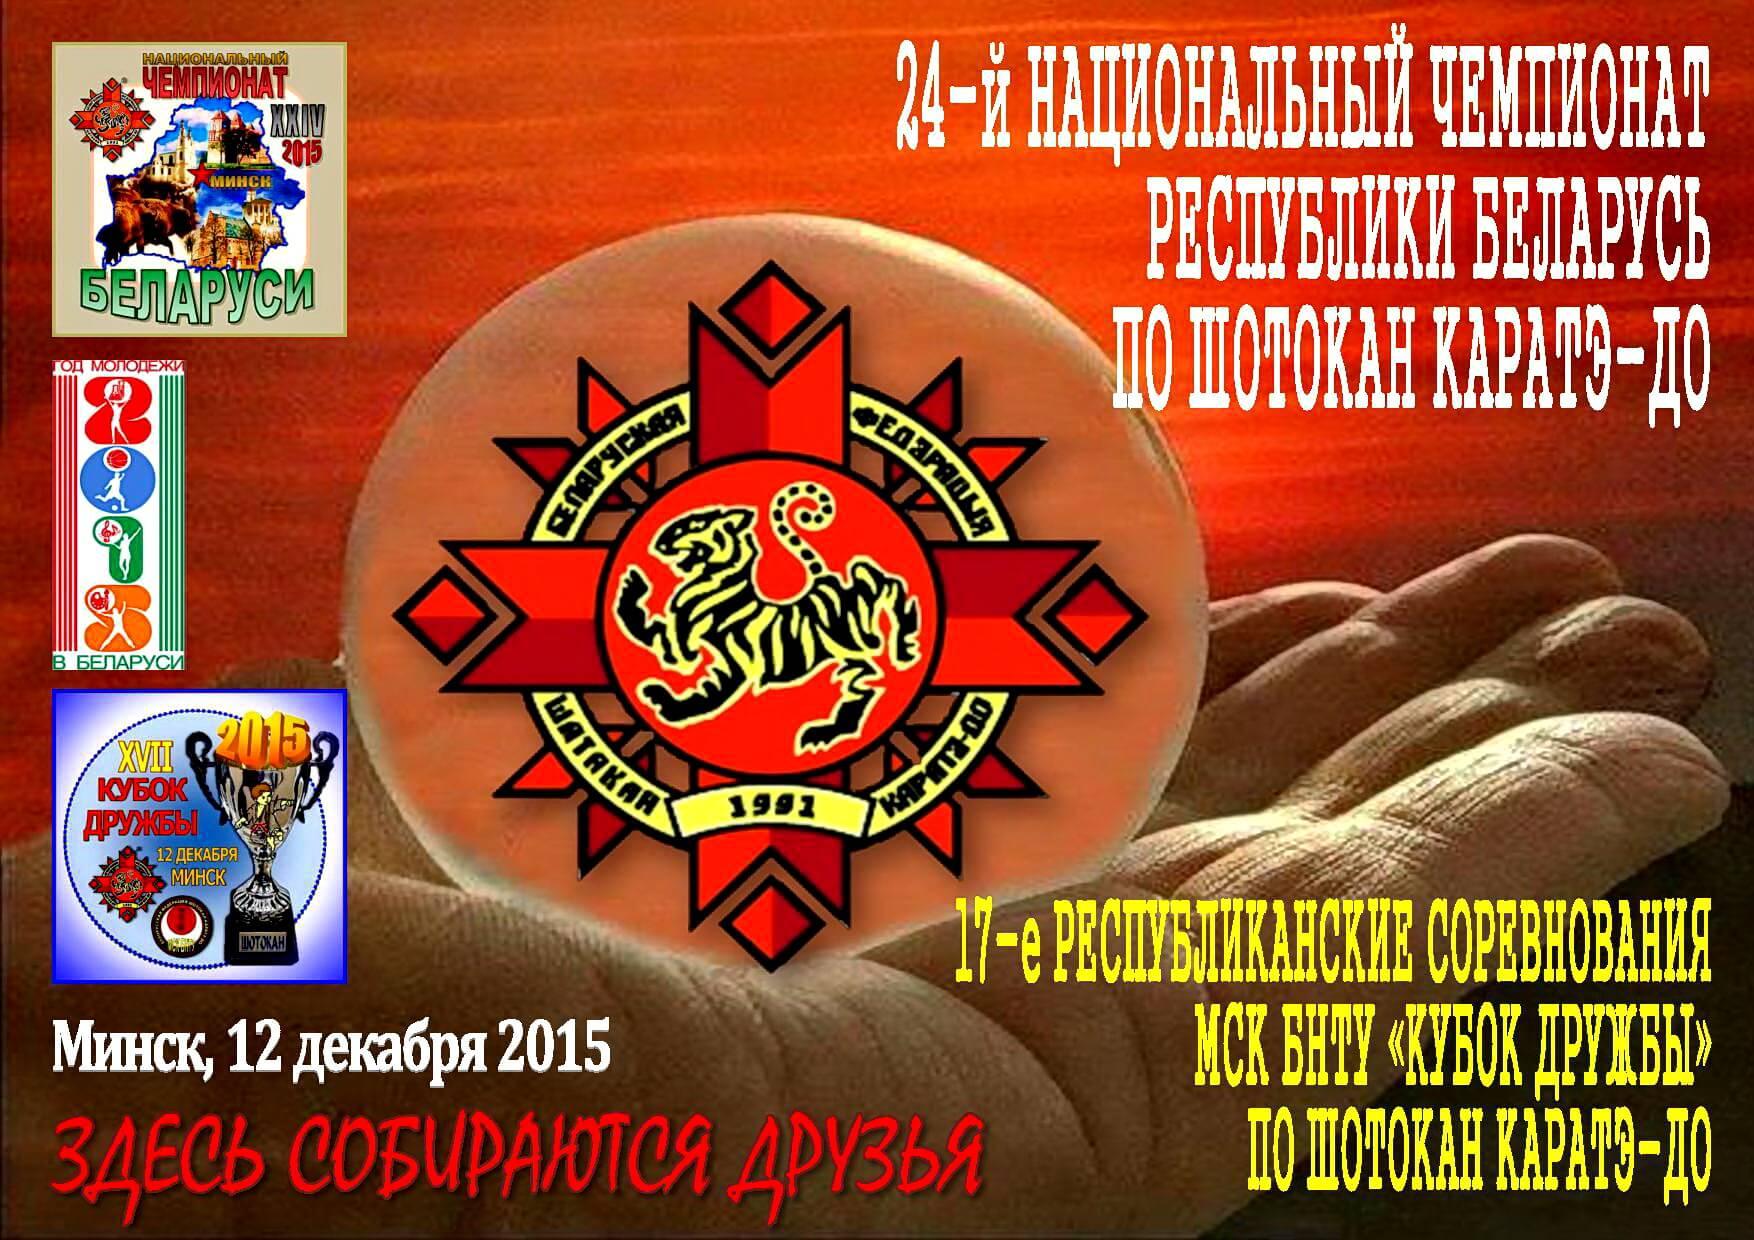 НЧРБ К-Дружбы-2015 Постер